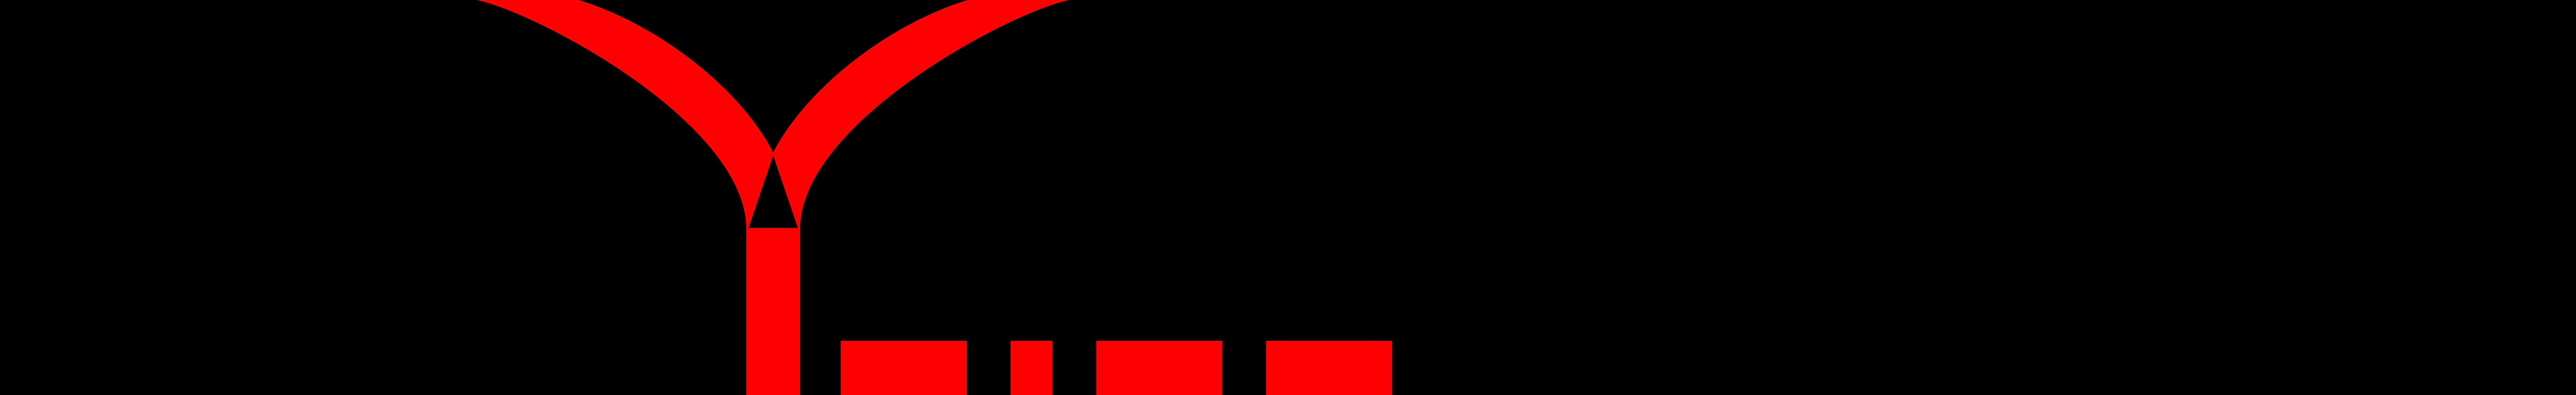 Logo 10 2015 simple